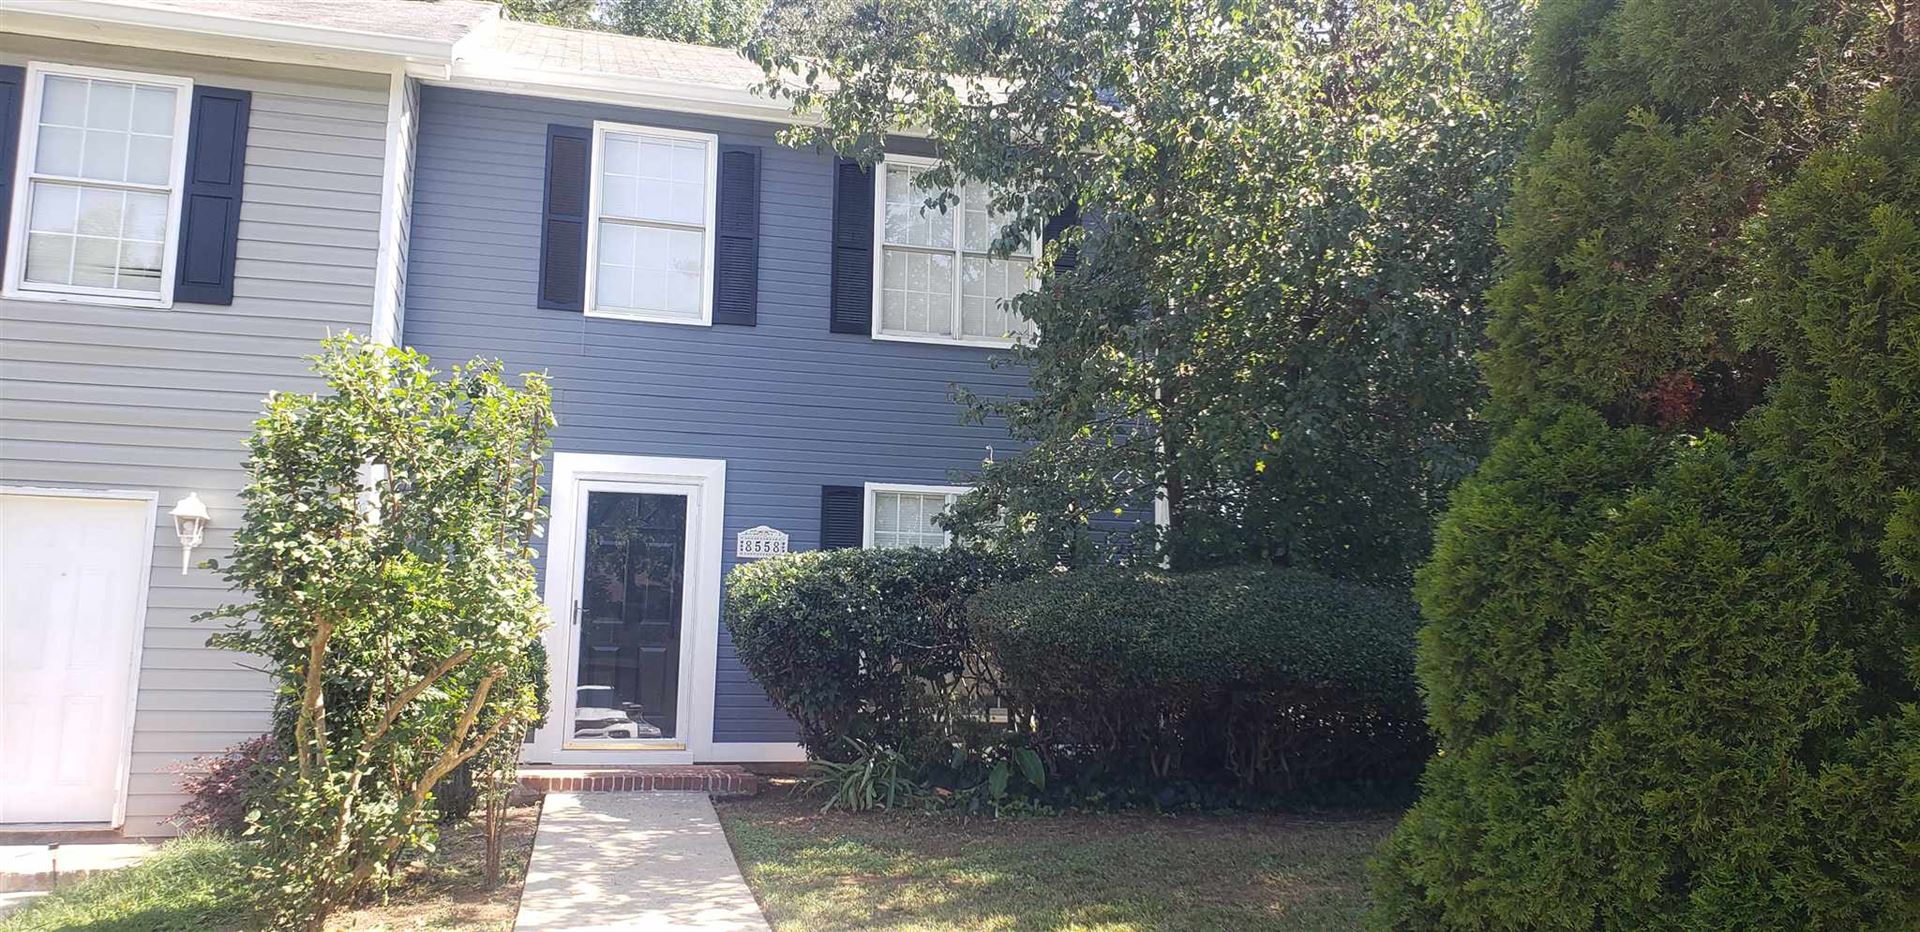 8558 Jamestown Way, Riverdale, GA 30274 - #: 8860412